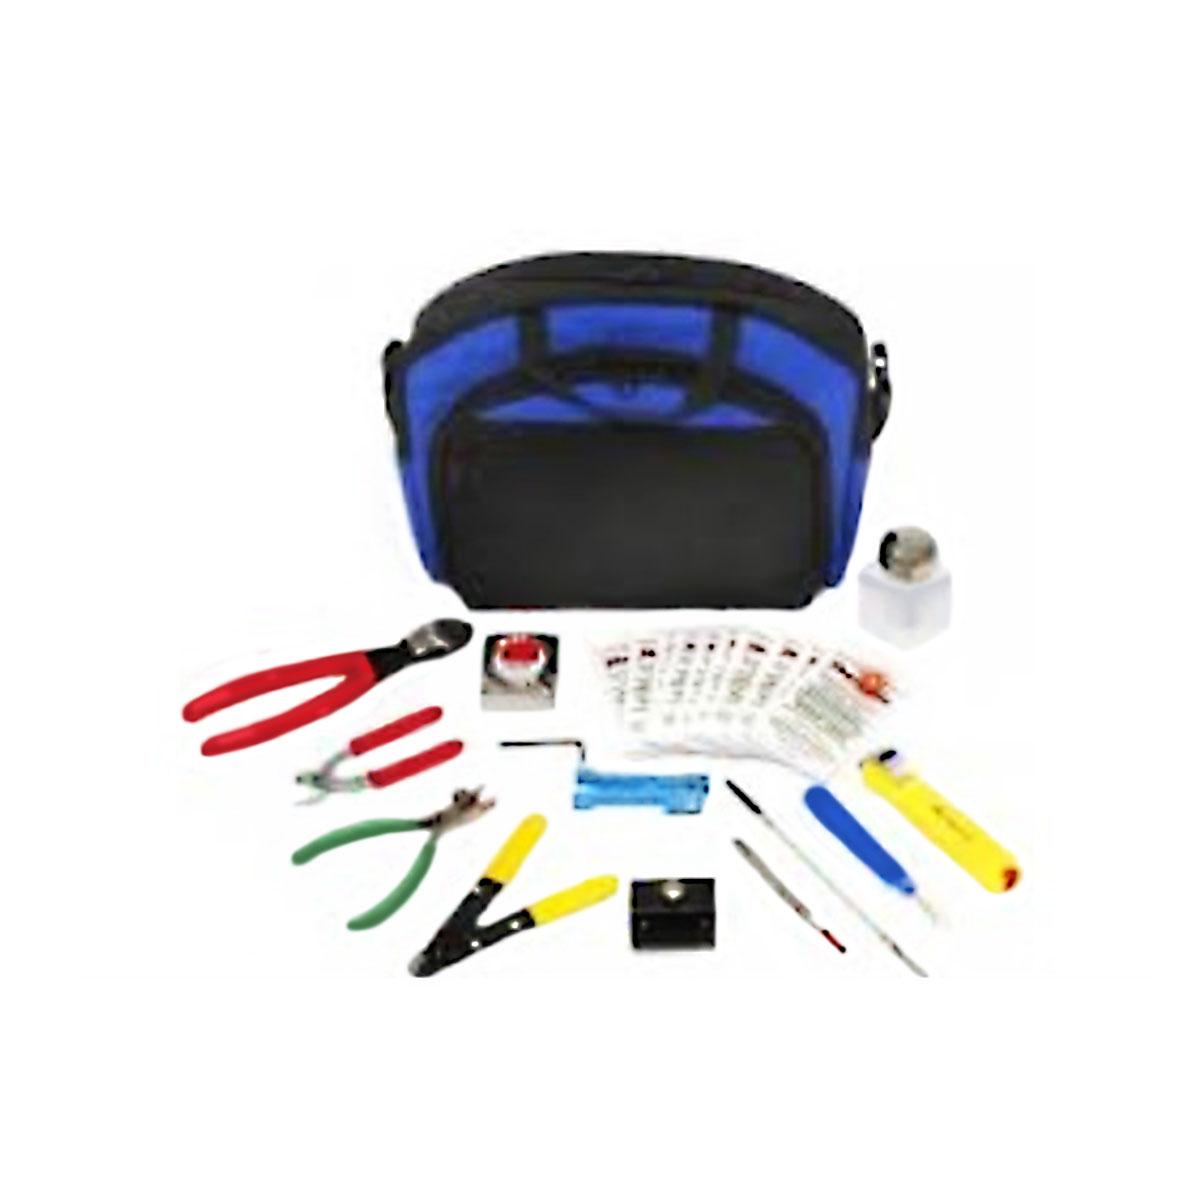 Kit de herramientas de empalme Corning TKT-SPLICE TKT-Splice